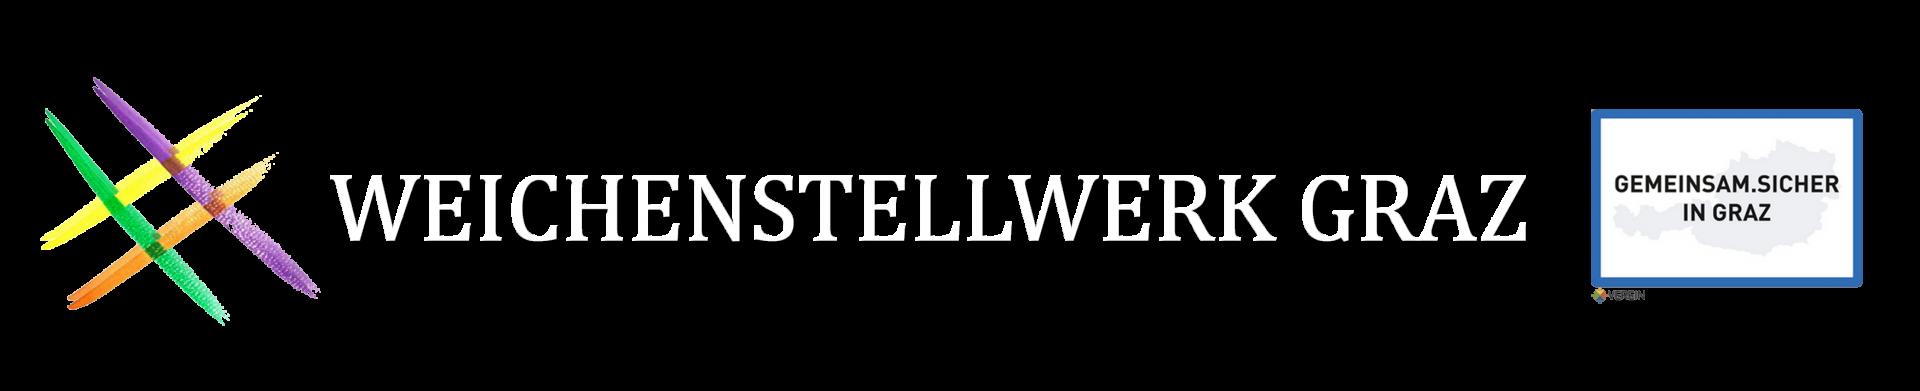 logo_WSW_Gesi_freigestellt_weiß